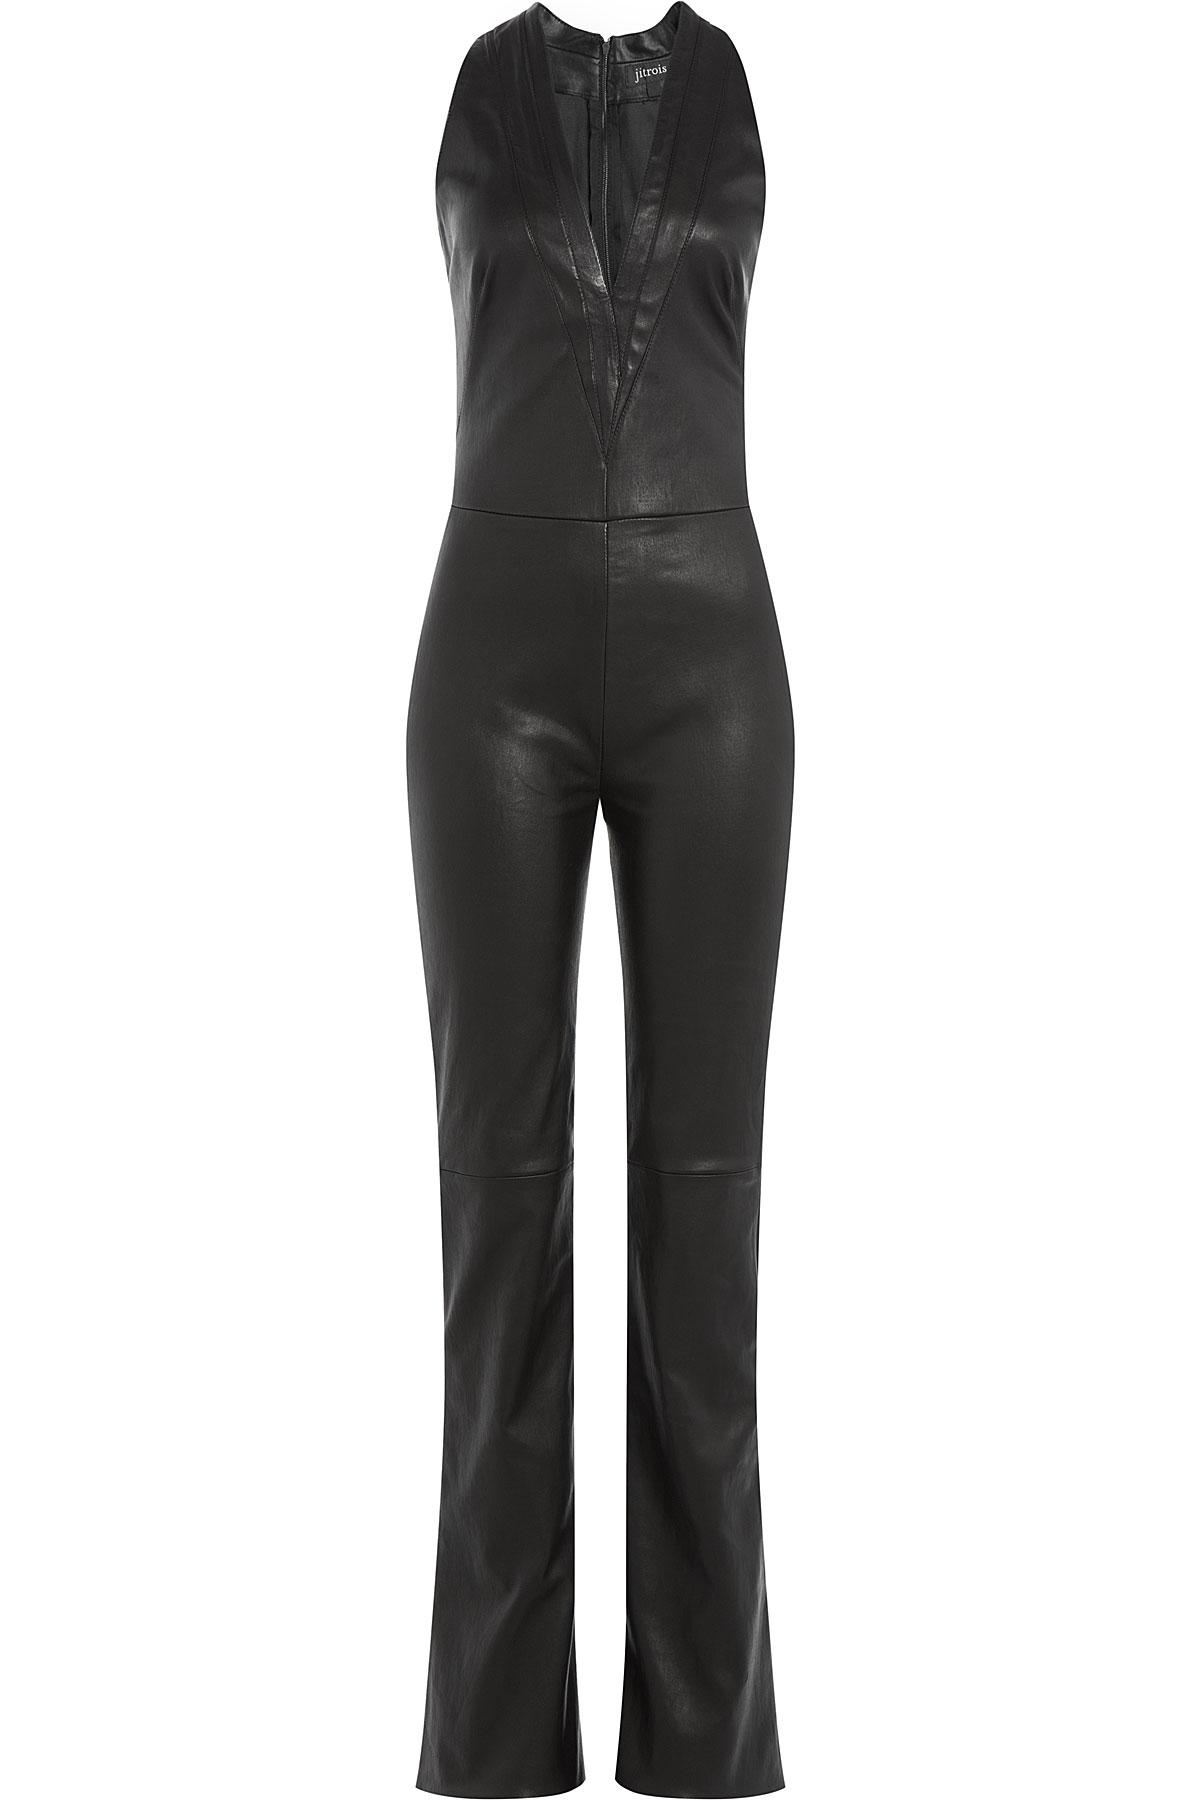 Jitrois Leather Jumpsuit - Black in Black | Lyst